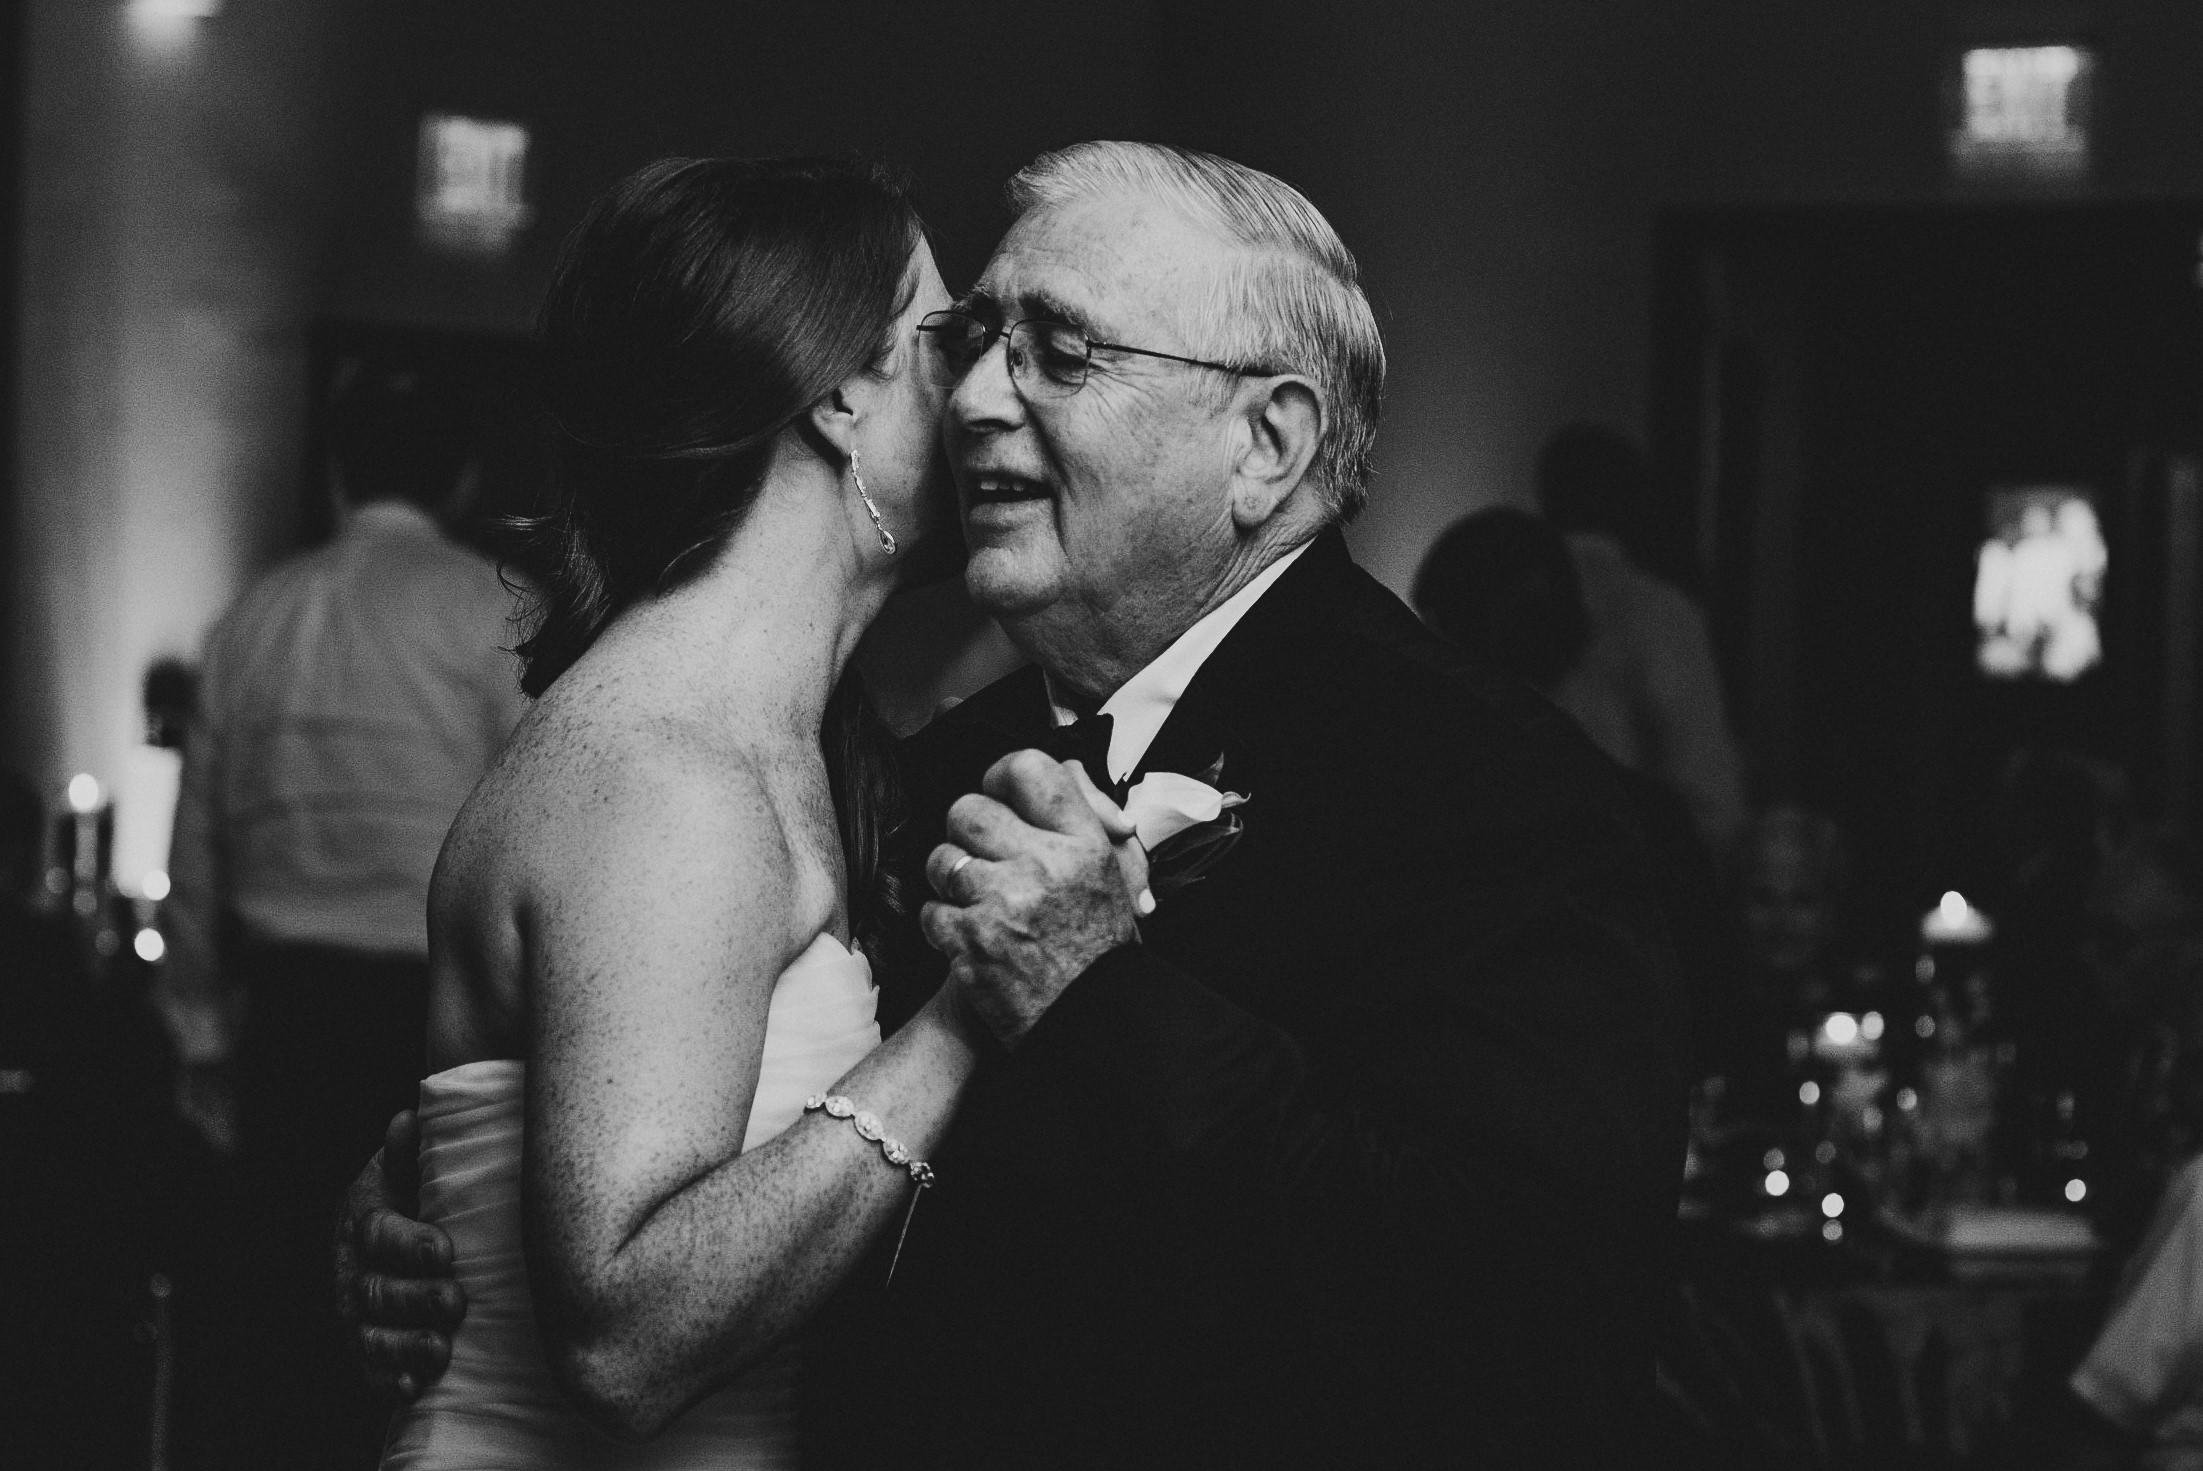 Wedding at W Hotel Washington DC by Mantas Kubilinskas-34.jpg